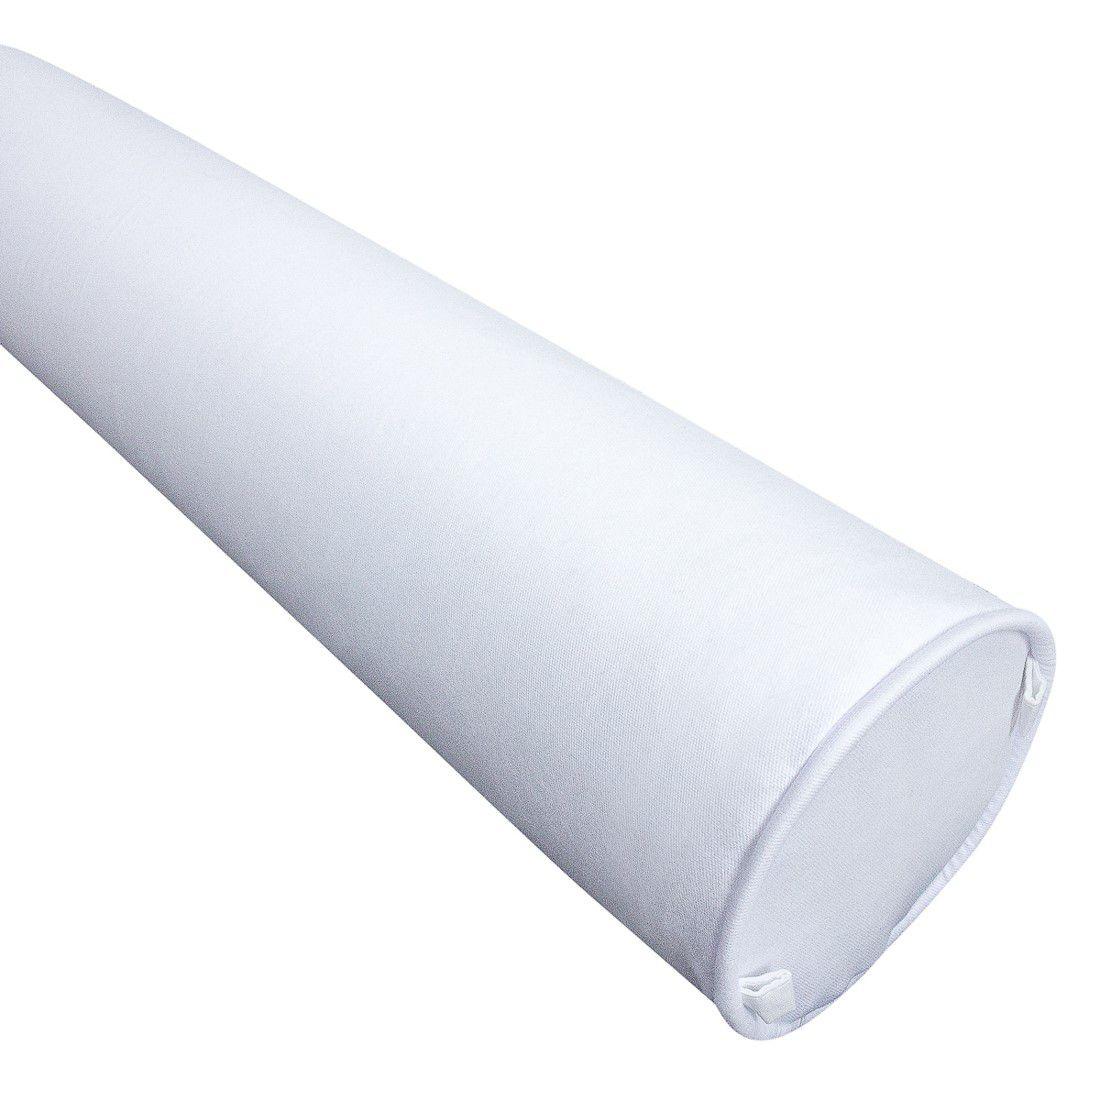 Rolo lateral para berço 130 cm branco